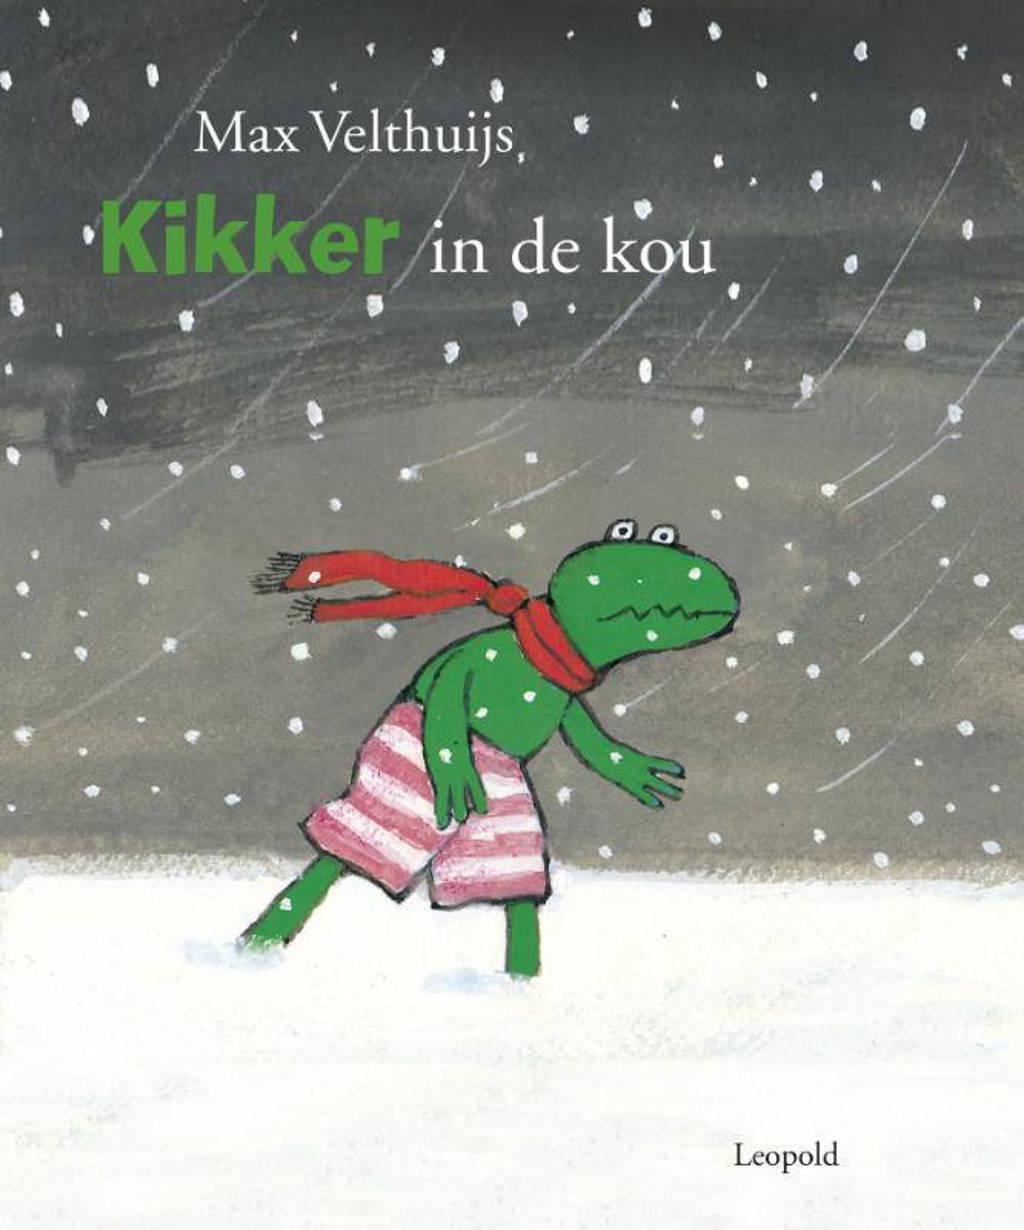 Kikker in de kou - Max Velthuijs